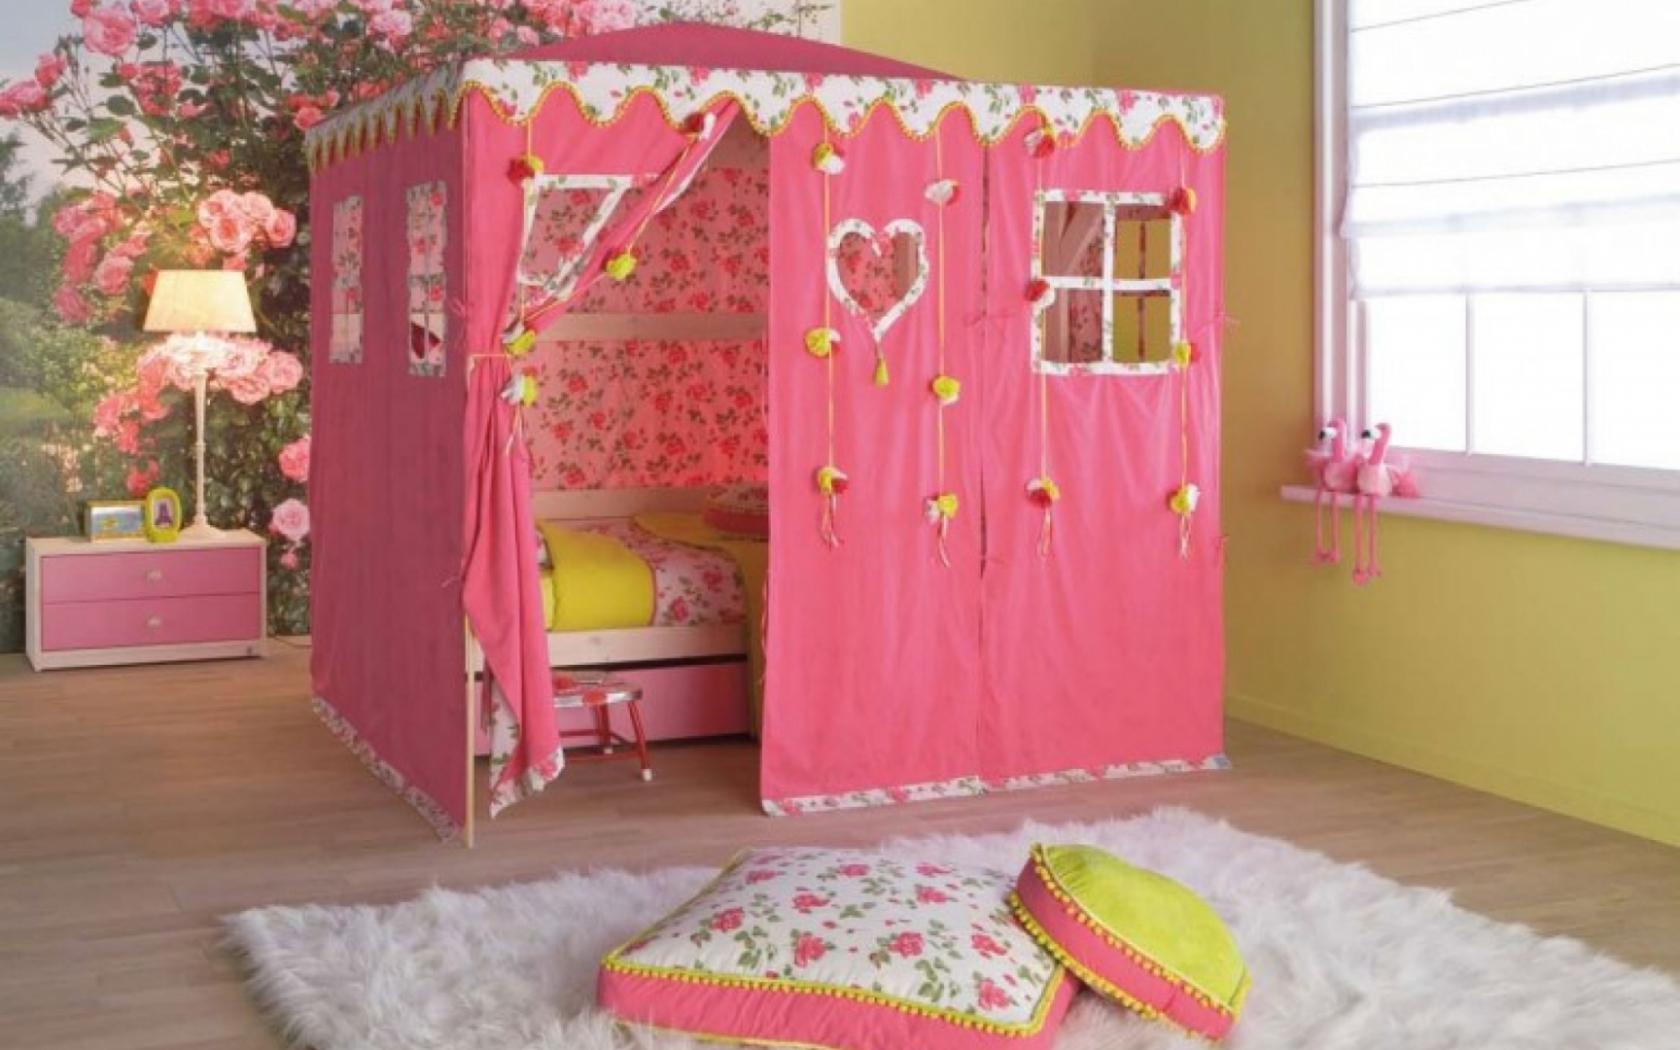 Free Download Bedroom Ideas Painting Girl Bedroom Ideas Painting